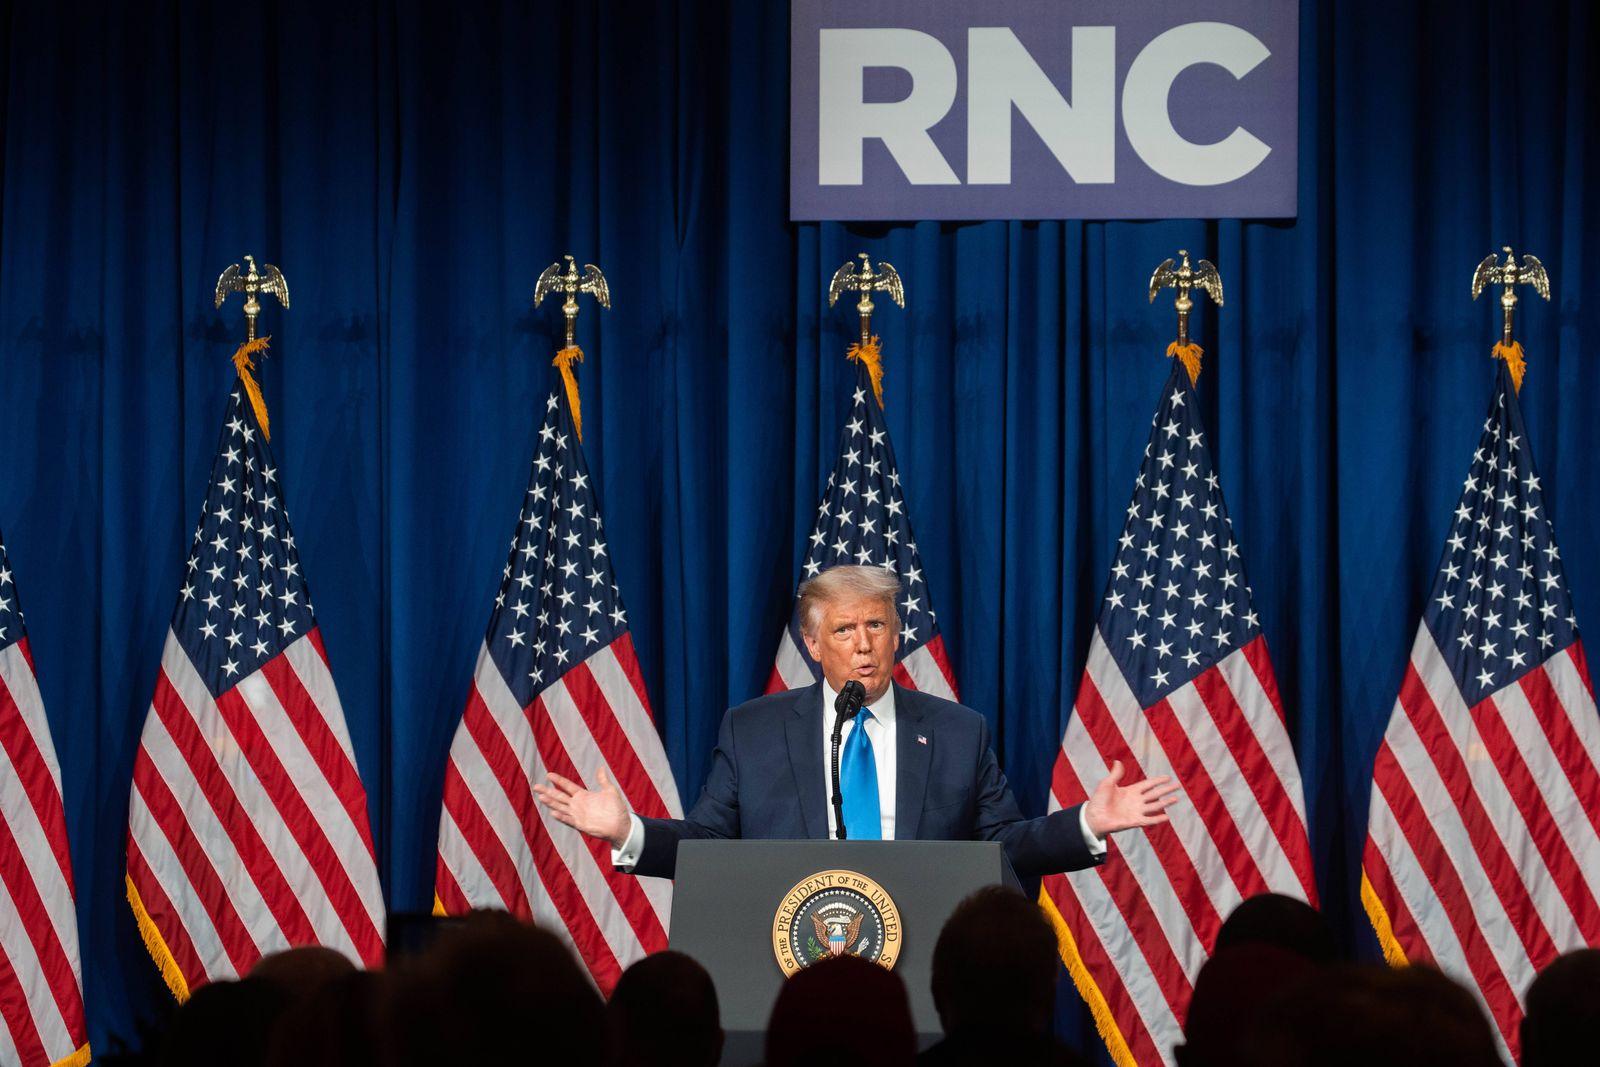 August 24, 2020, Charlotte, North Carolina, USA: United States President DONALD J. TRUMP speaks at the Republican Natio